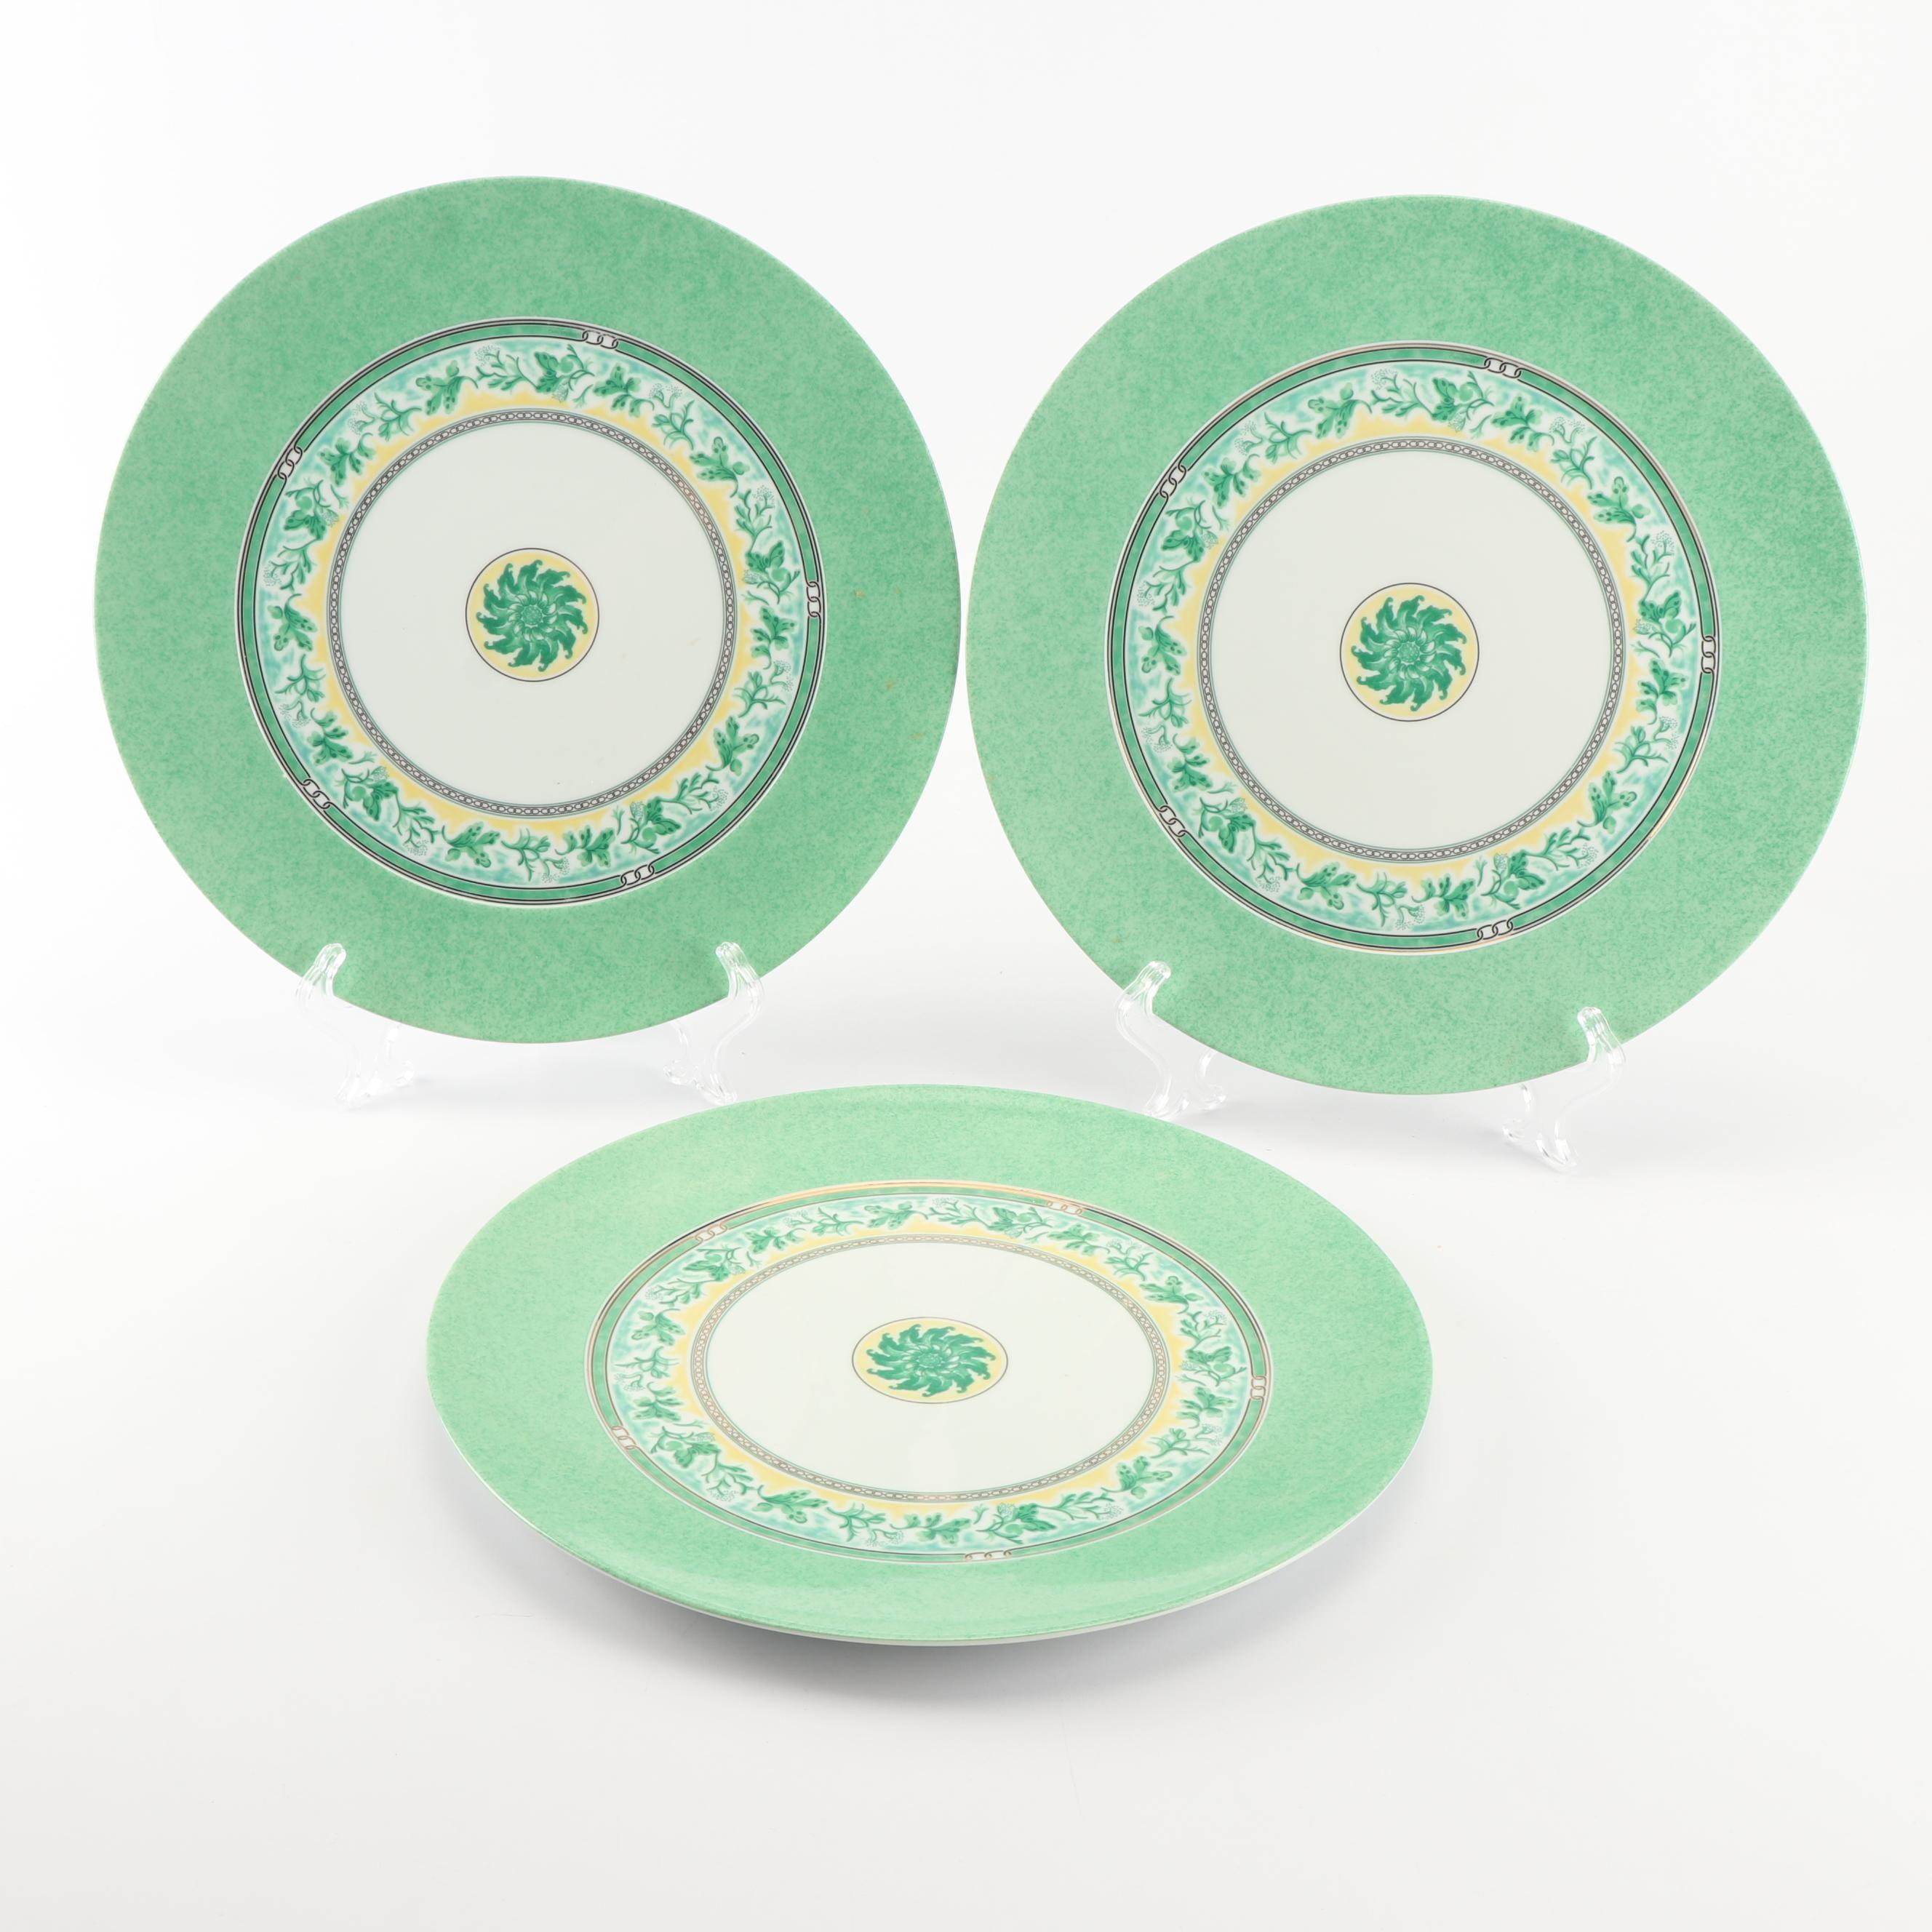 "Christofle ""Alliance Vert Floral"" Porcelain Platters"